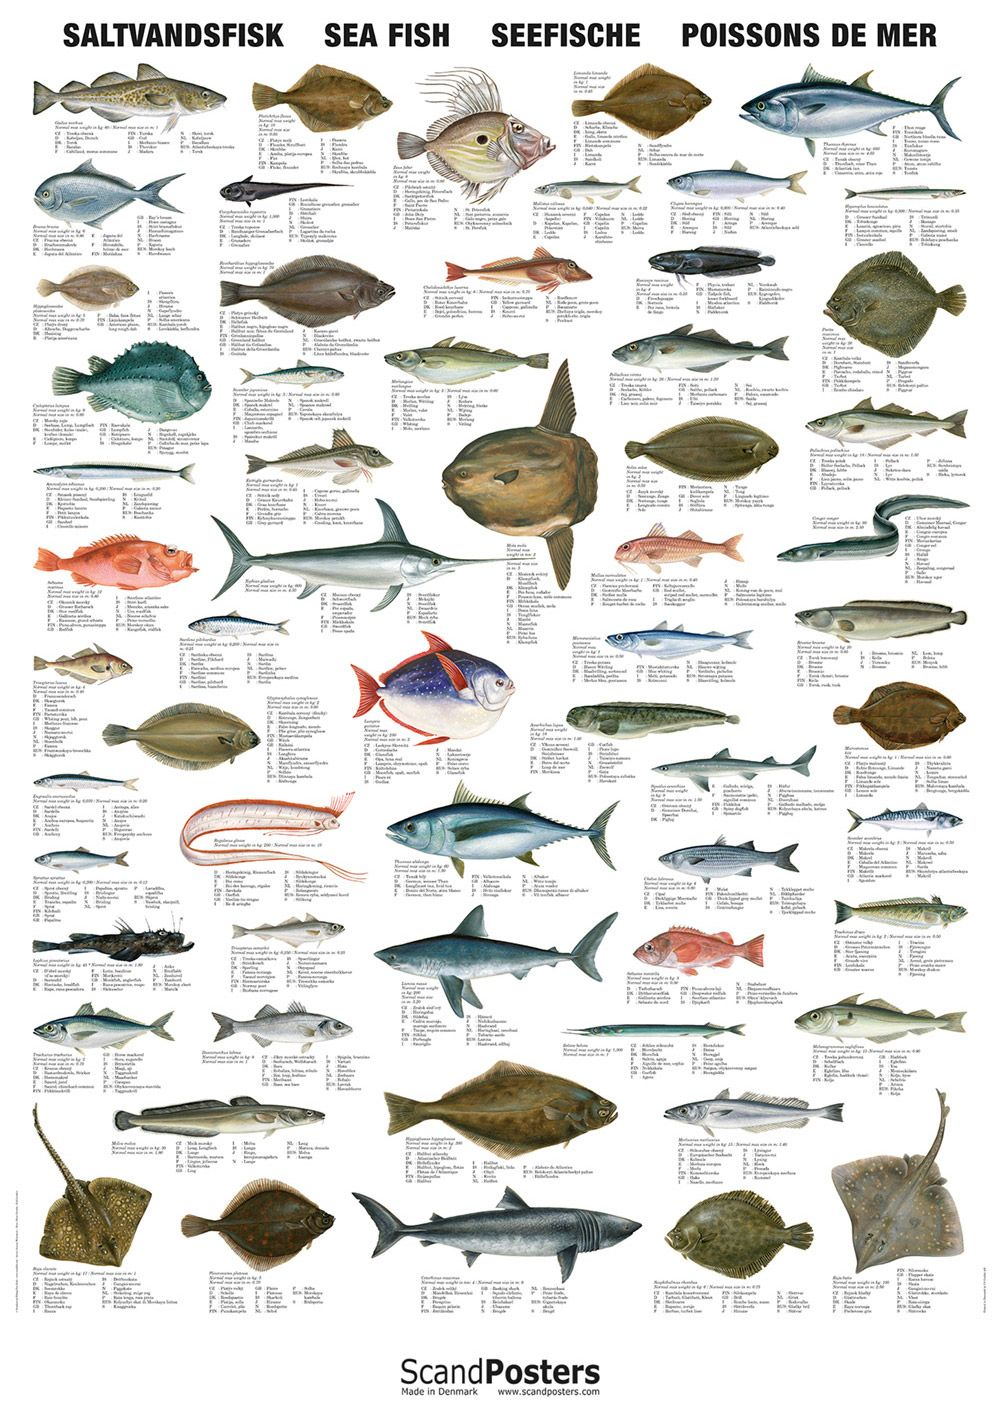 Saltwater Fish Chart Saltvandsfisk Seefische In 2020 Fish Chart Types Of Fish Sea Fish